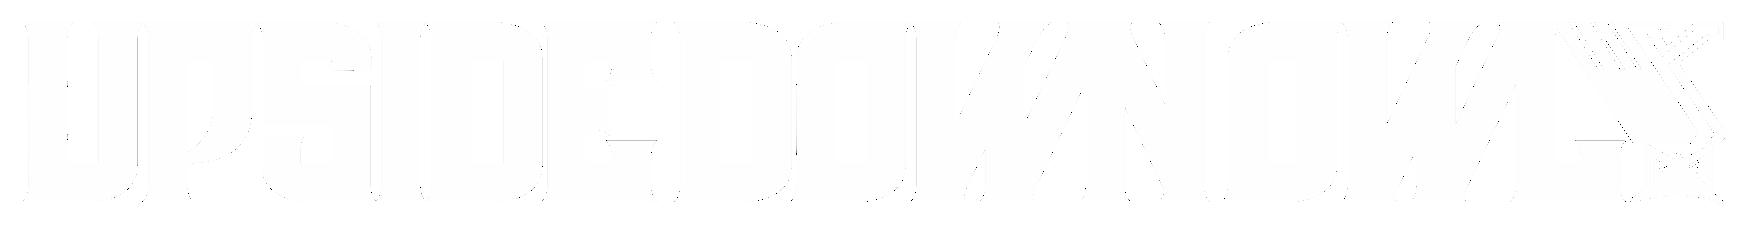 UpsideDownOwl